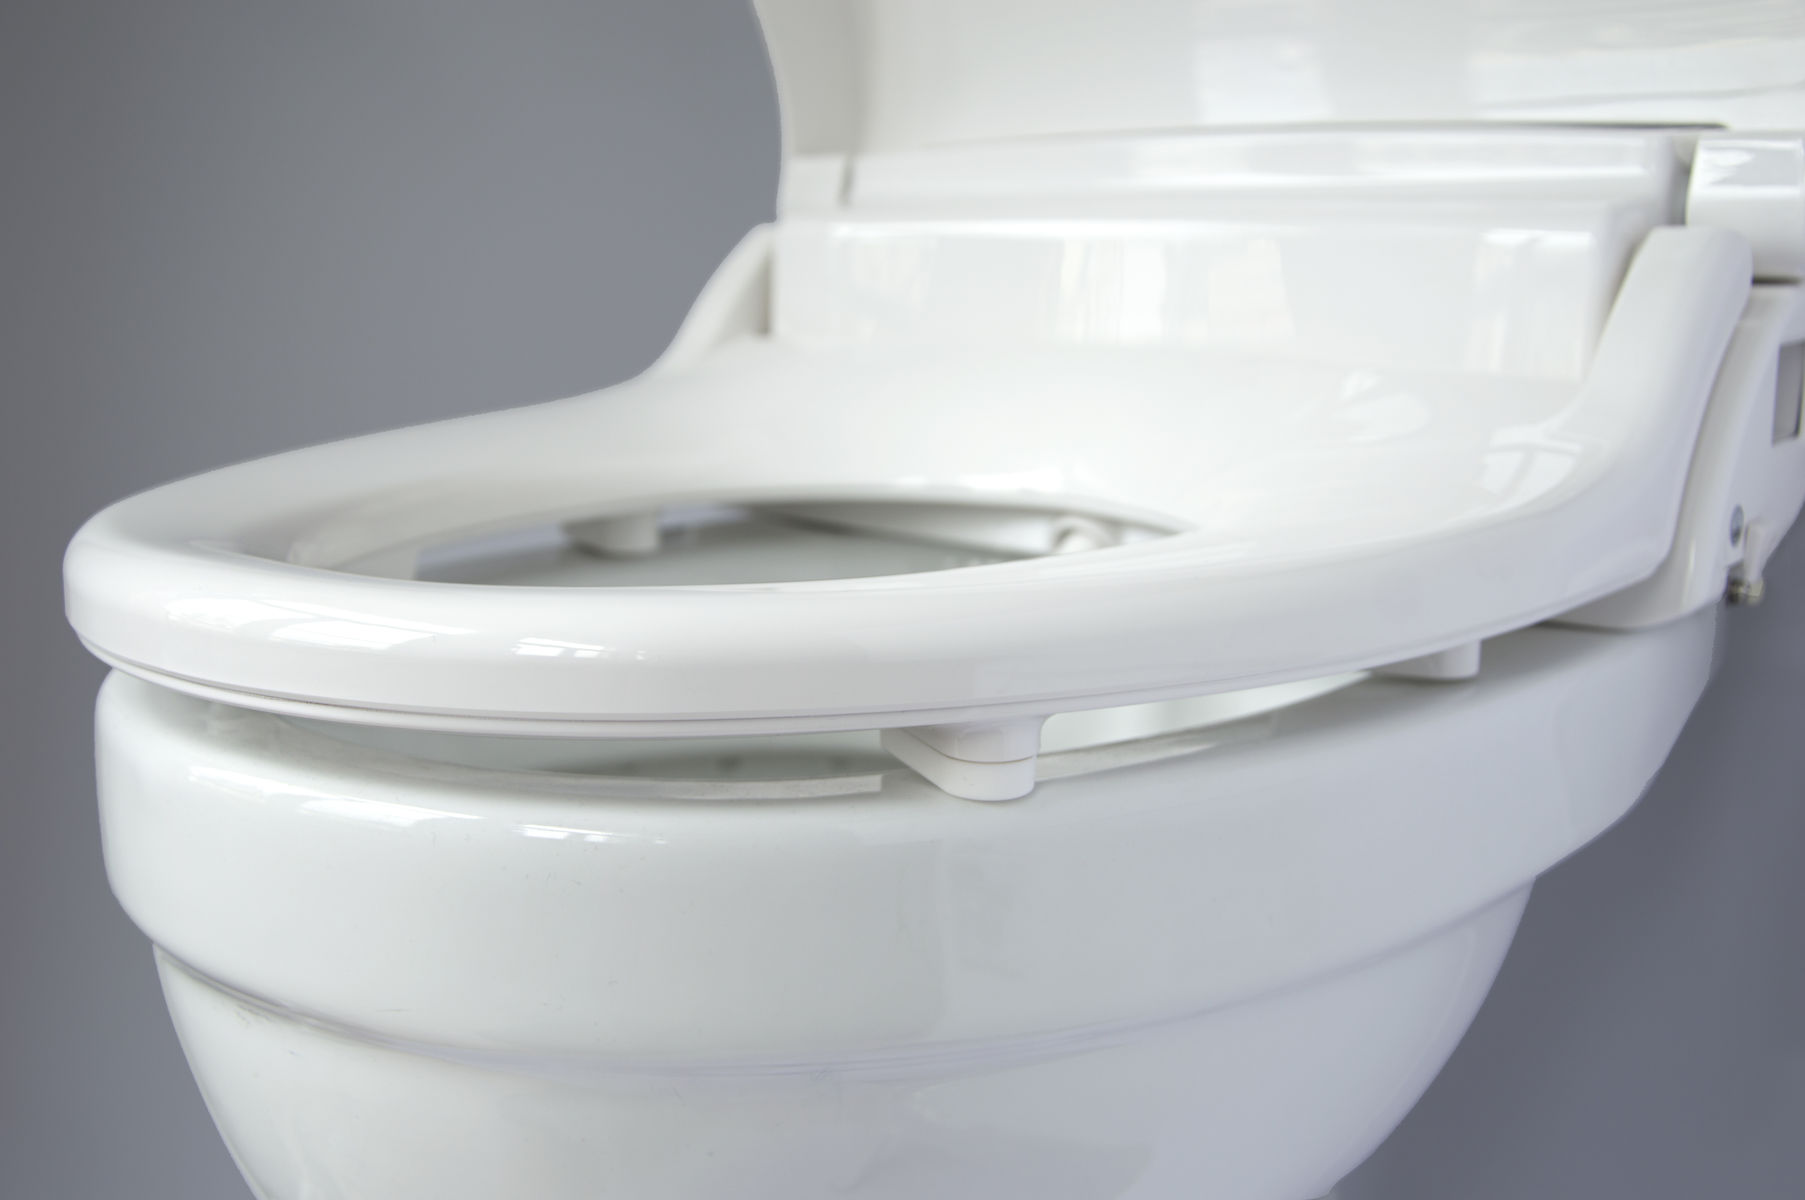 Bidet Toilet Kopen : Douche toilet prijs bol coway ba13 douchewc